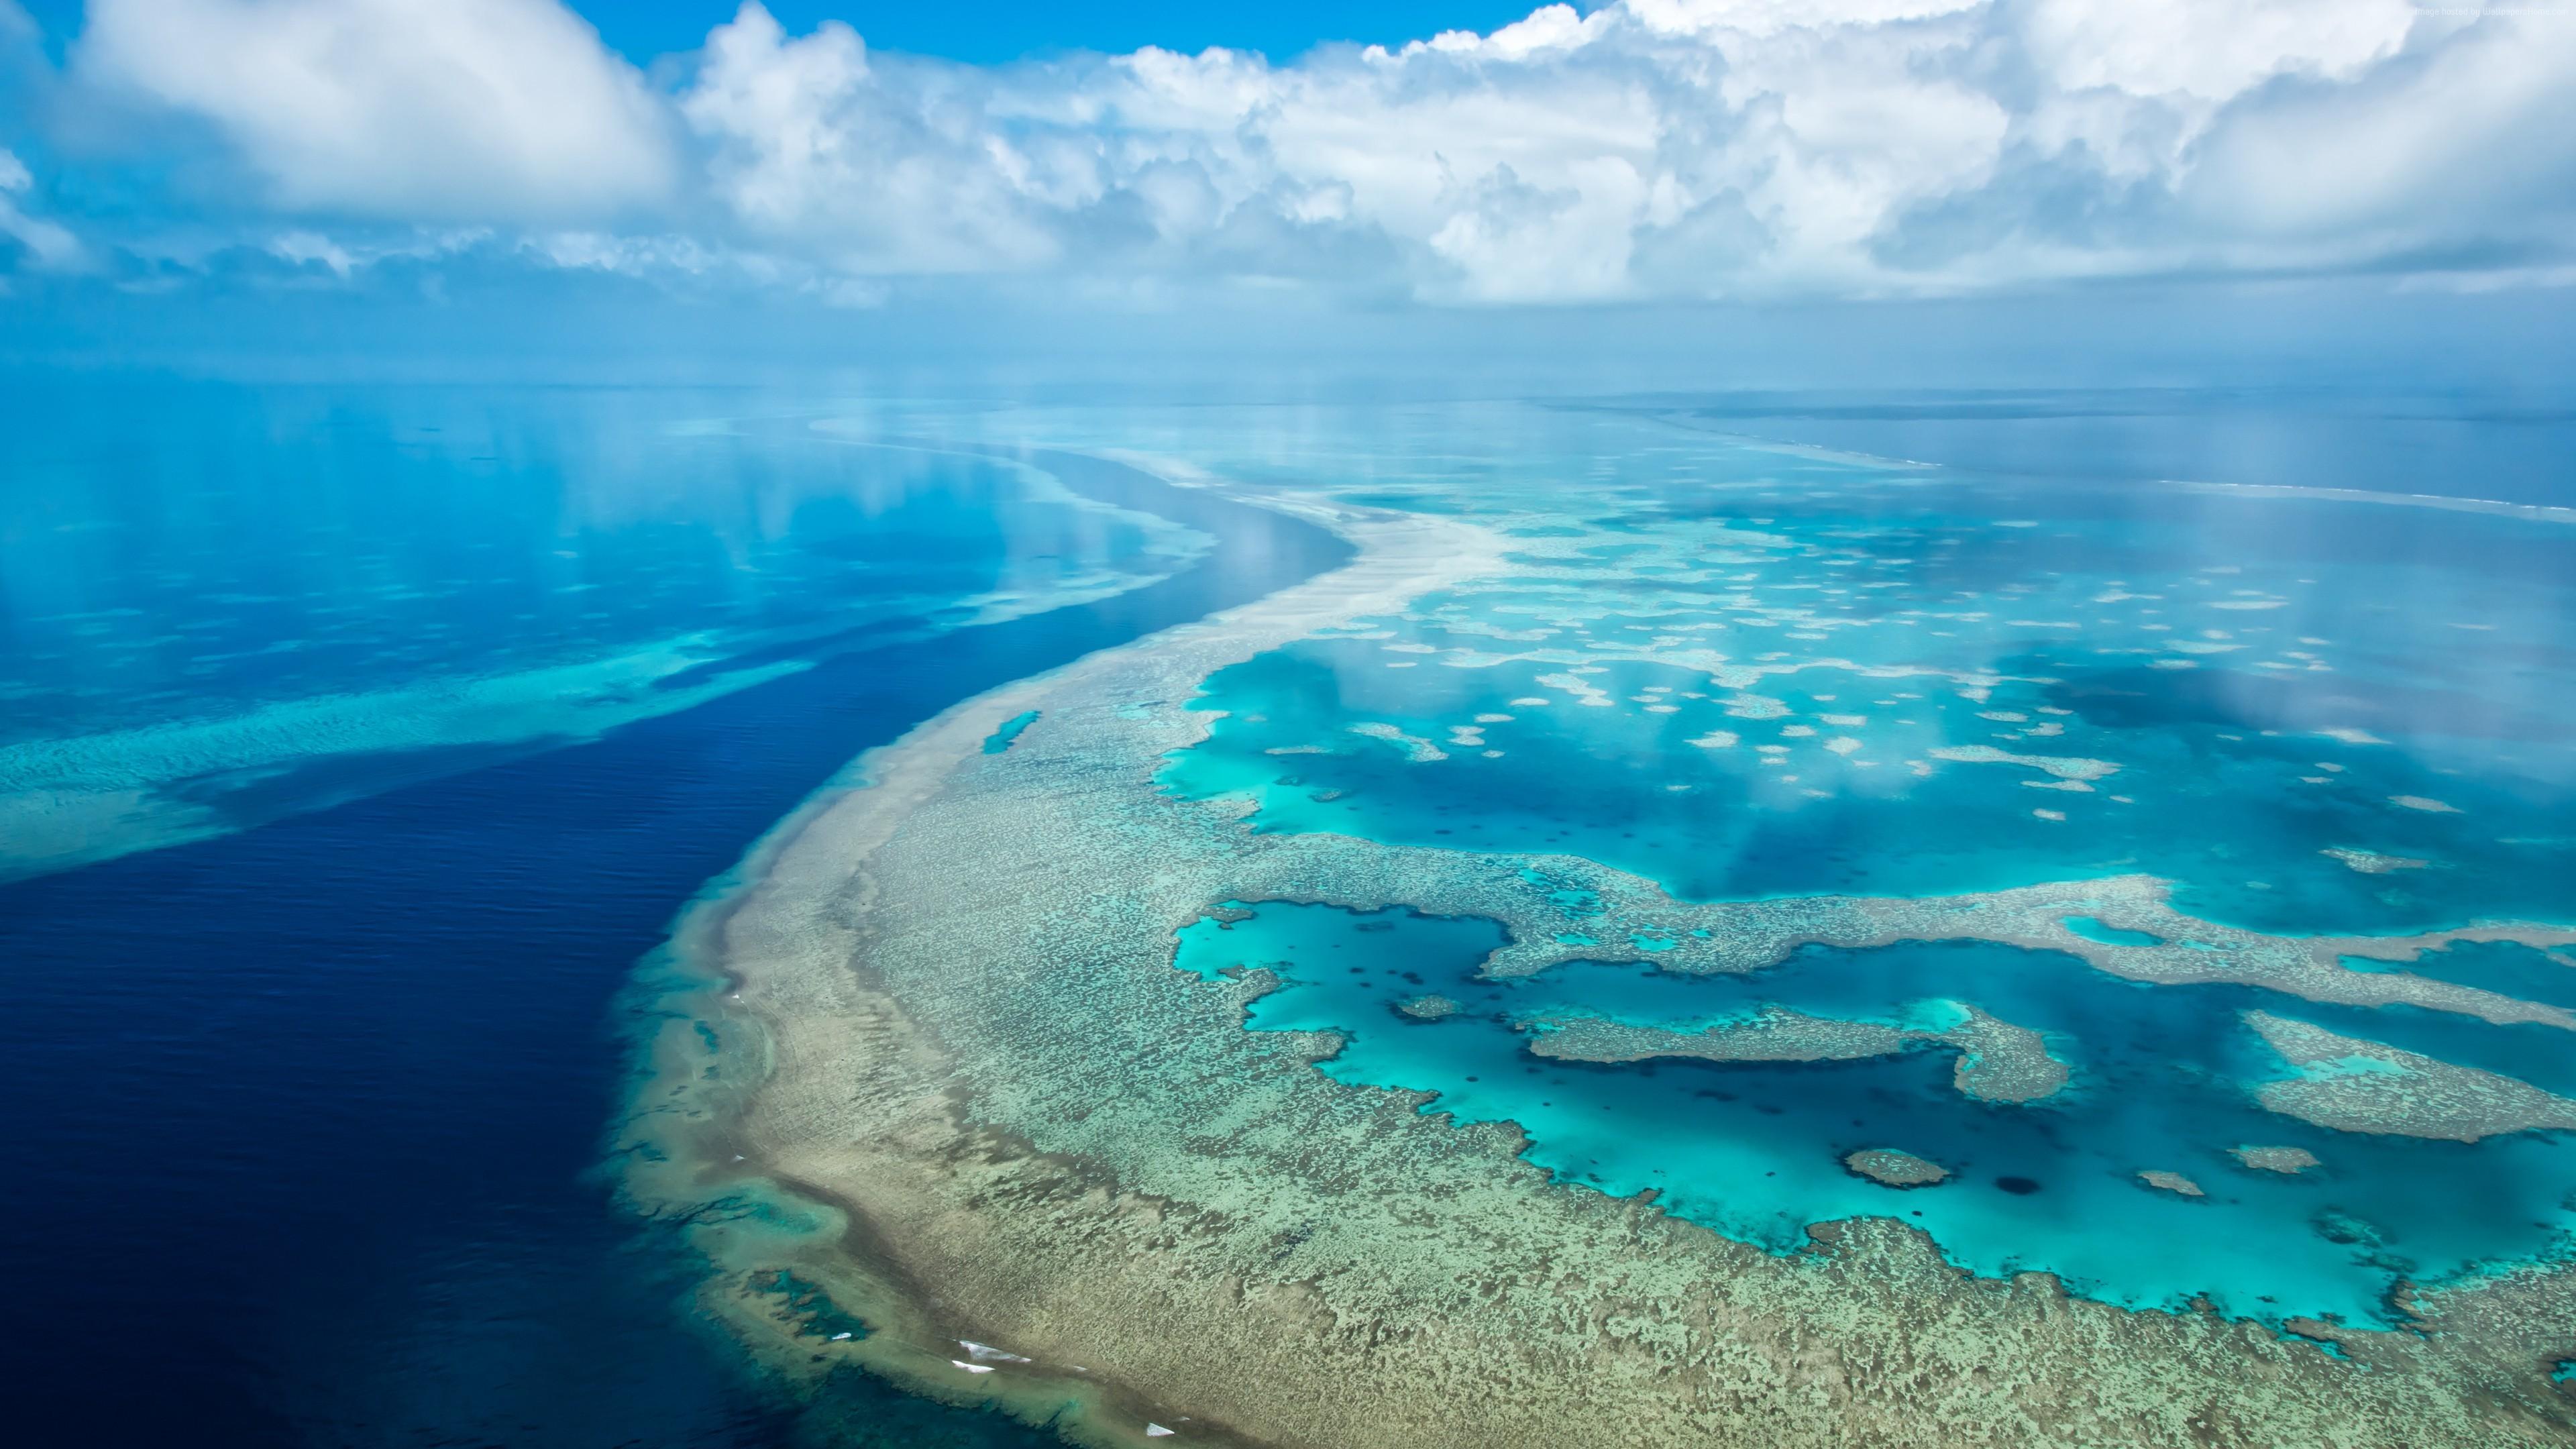 Ocean, 4k, HD wallpaper, clouds, Surface Hub, live wallpaper, …